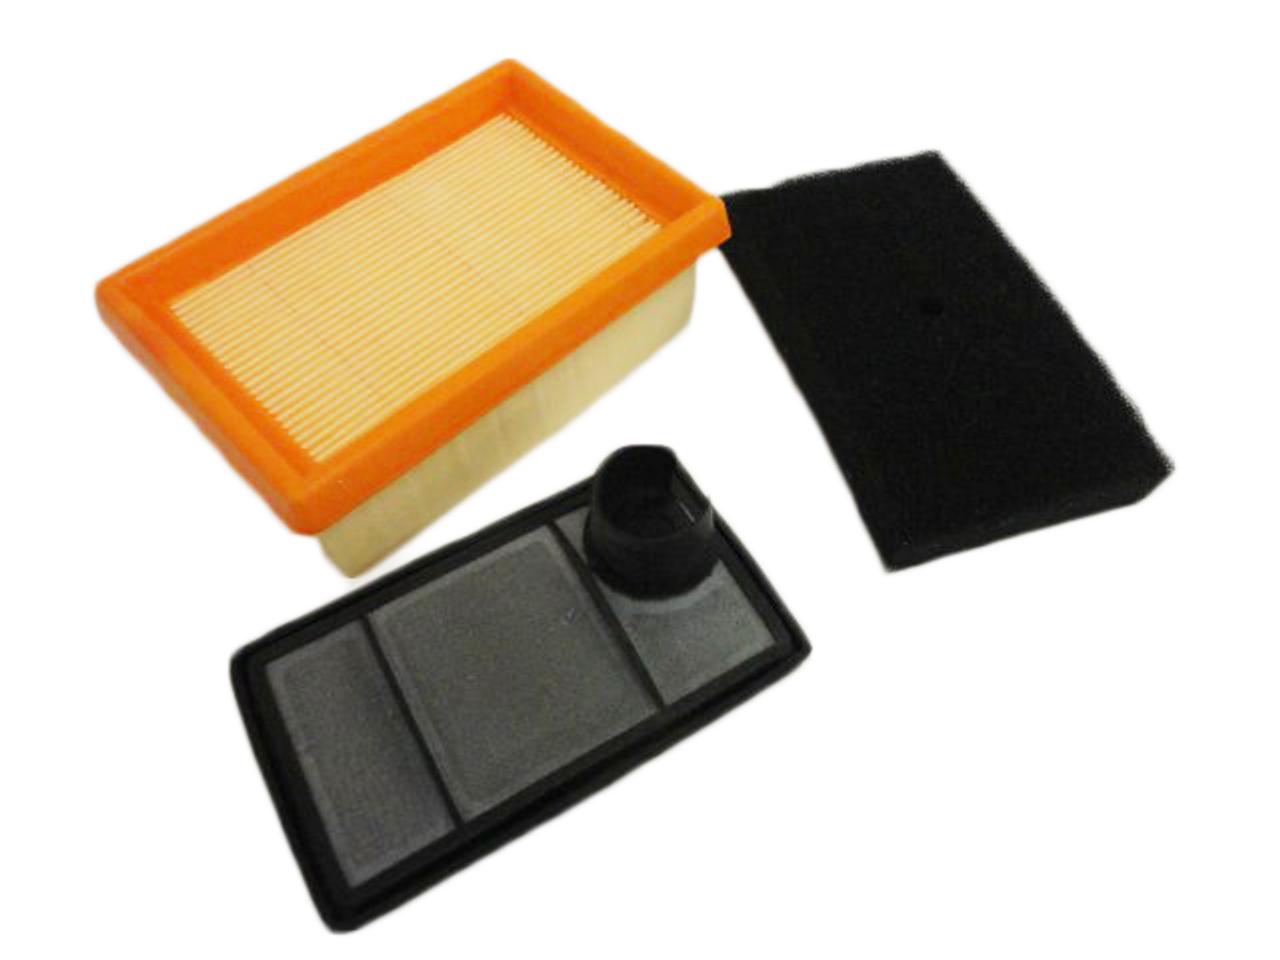 Dichtung Kit für Stihl TS400 TS 400 gasket kit